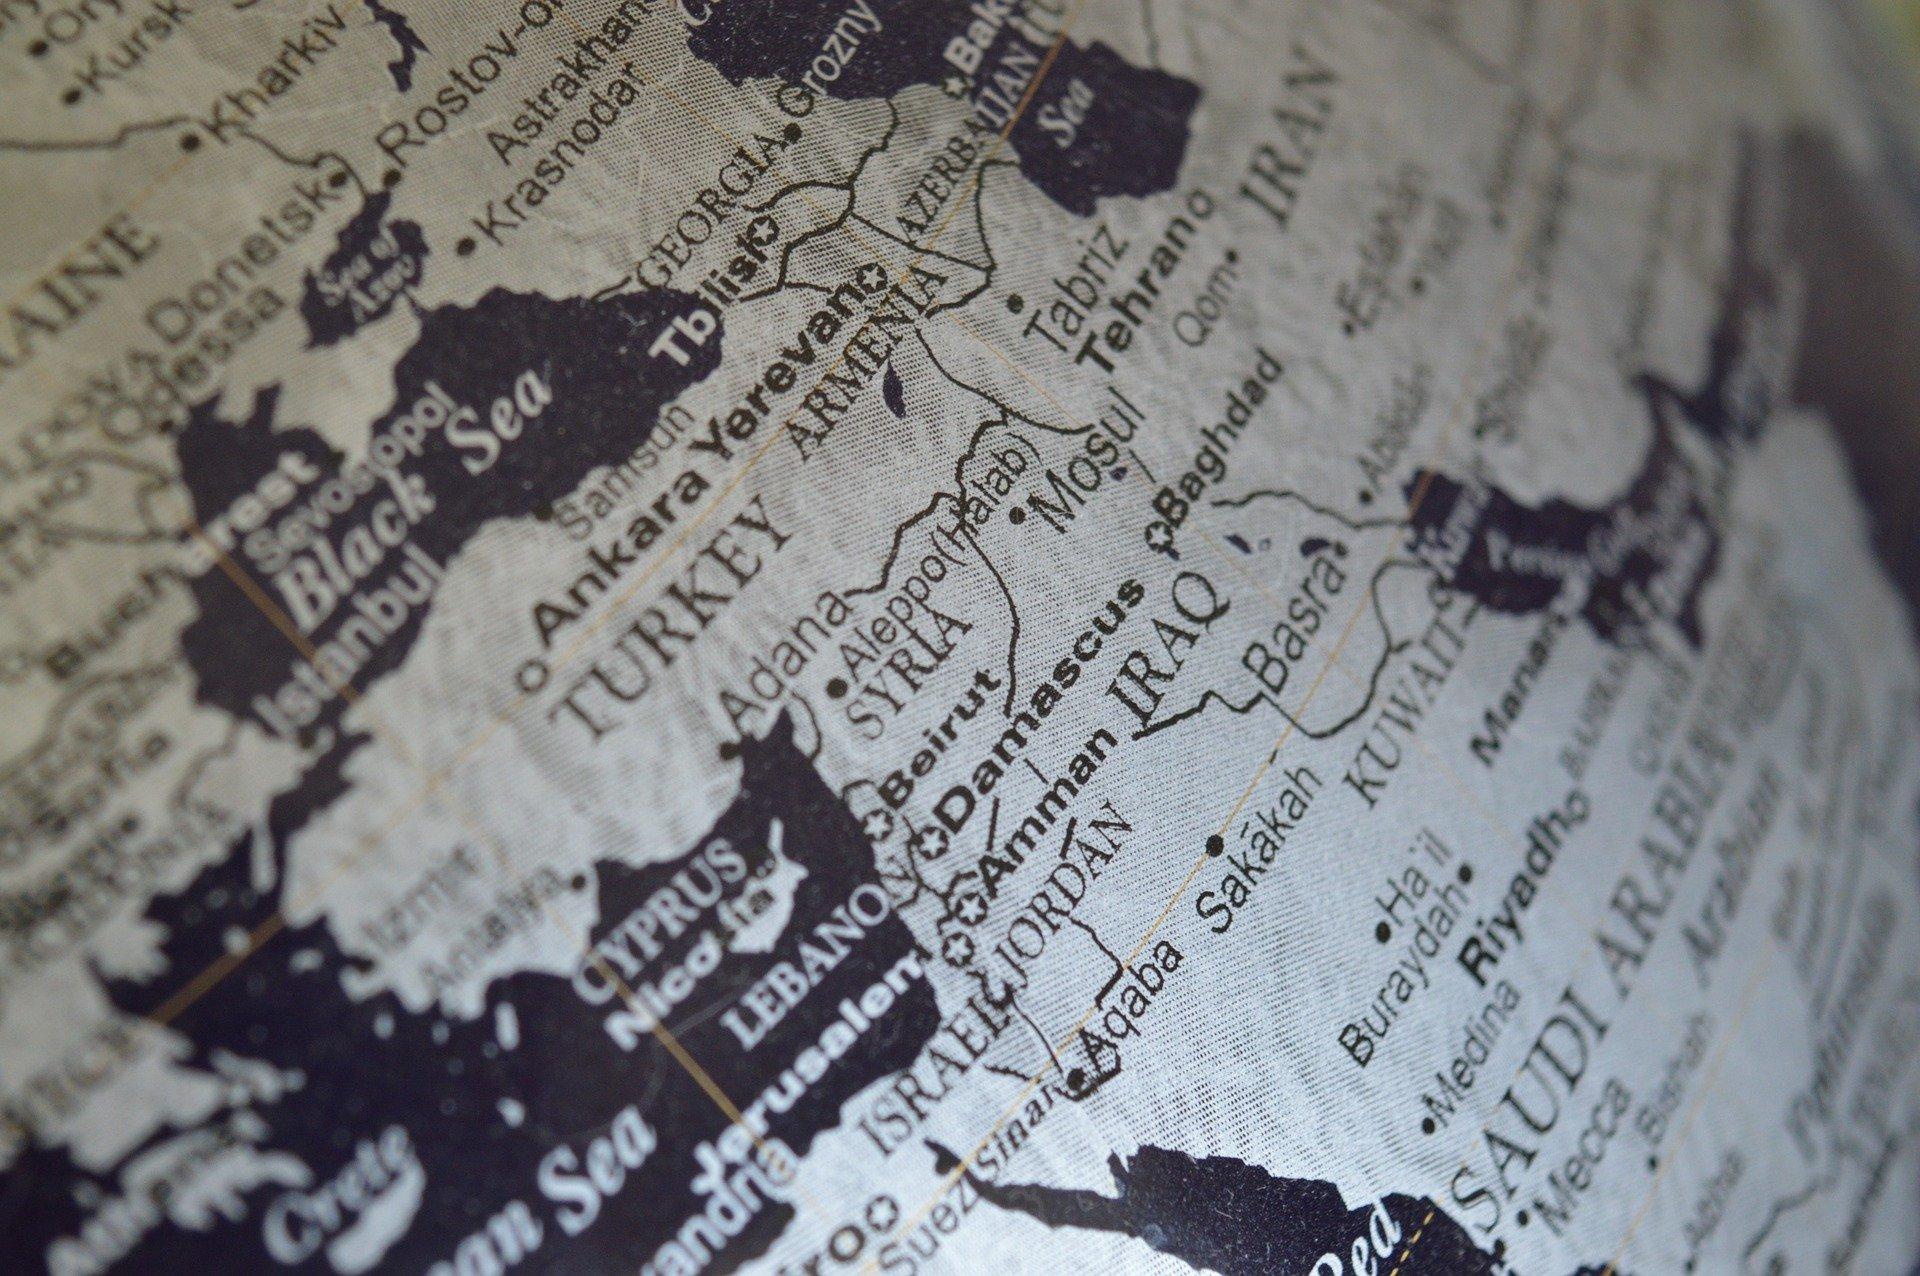 Daniel Turnberg Travel Fellowships Open to Applications